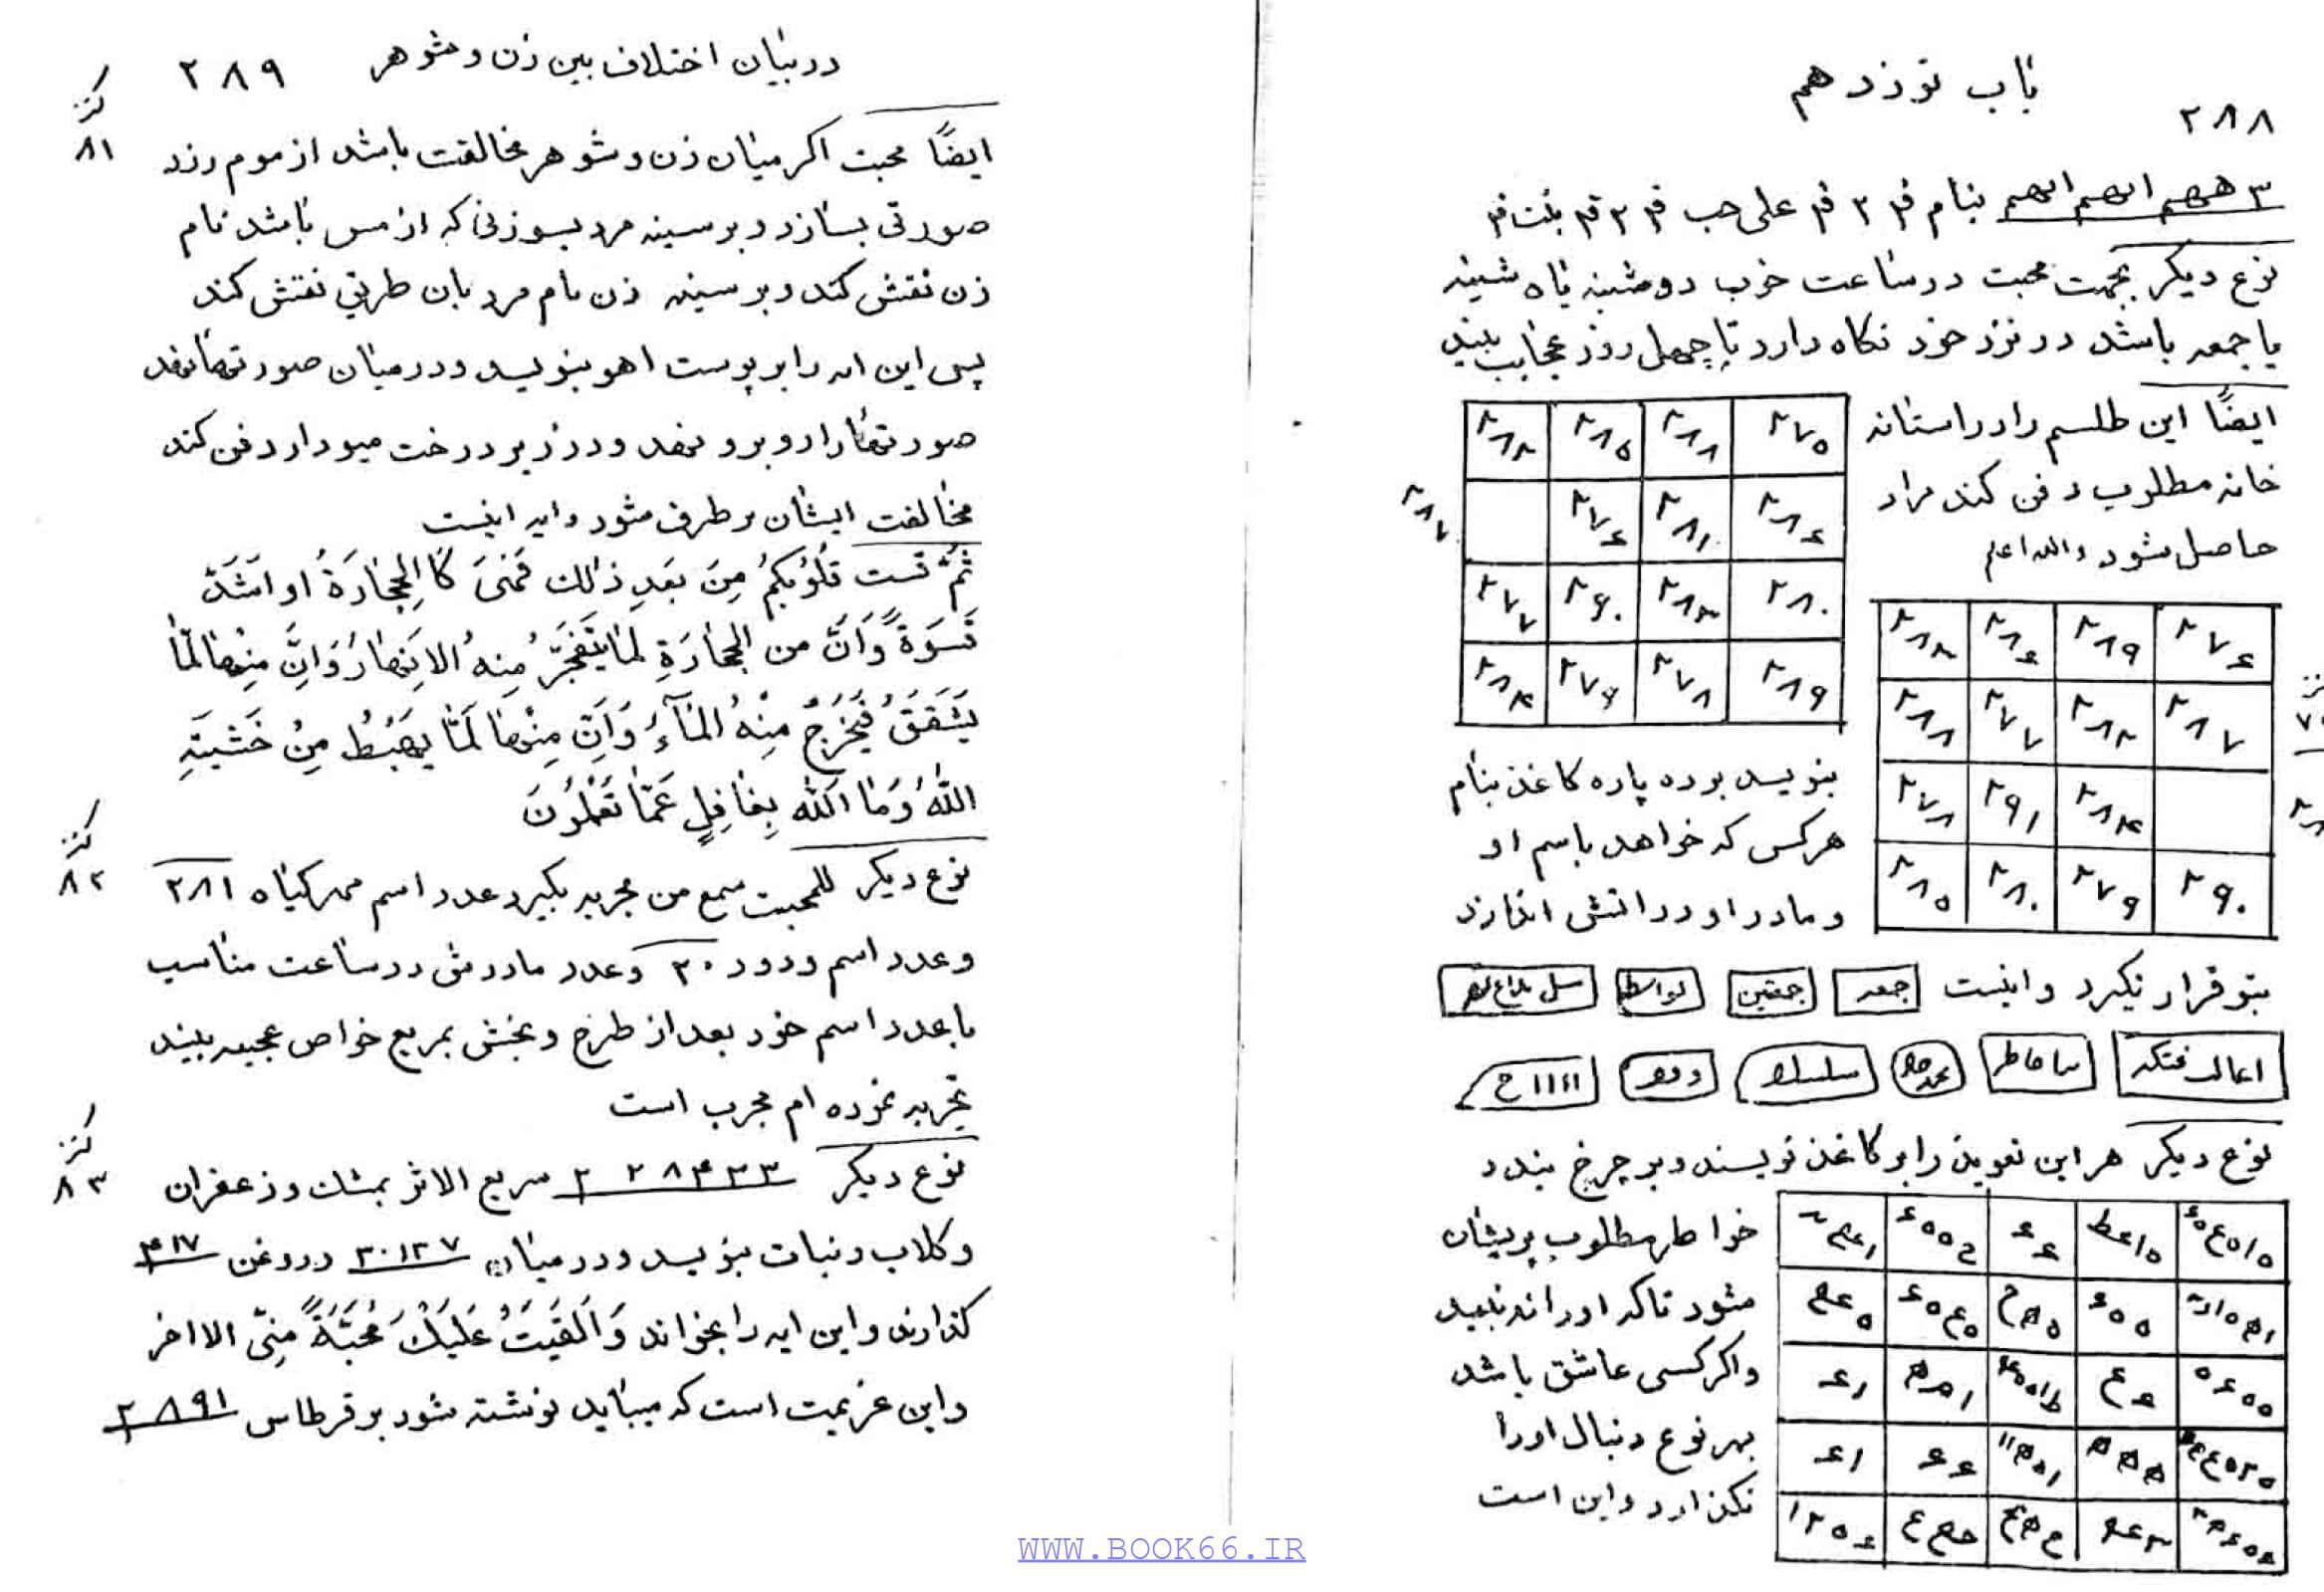 کنوز الاسرار الخفیه Pdf Books Pdf Books Download Free Ebooks Download Books